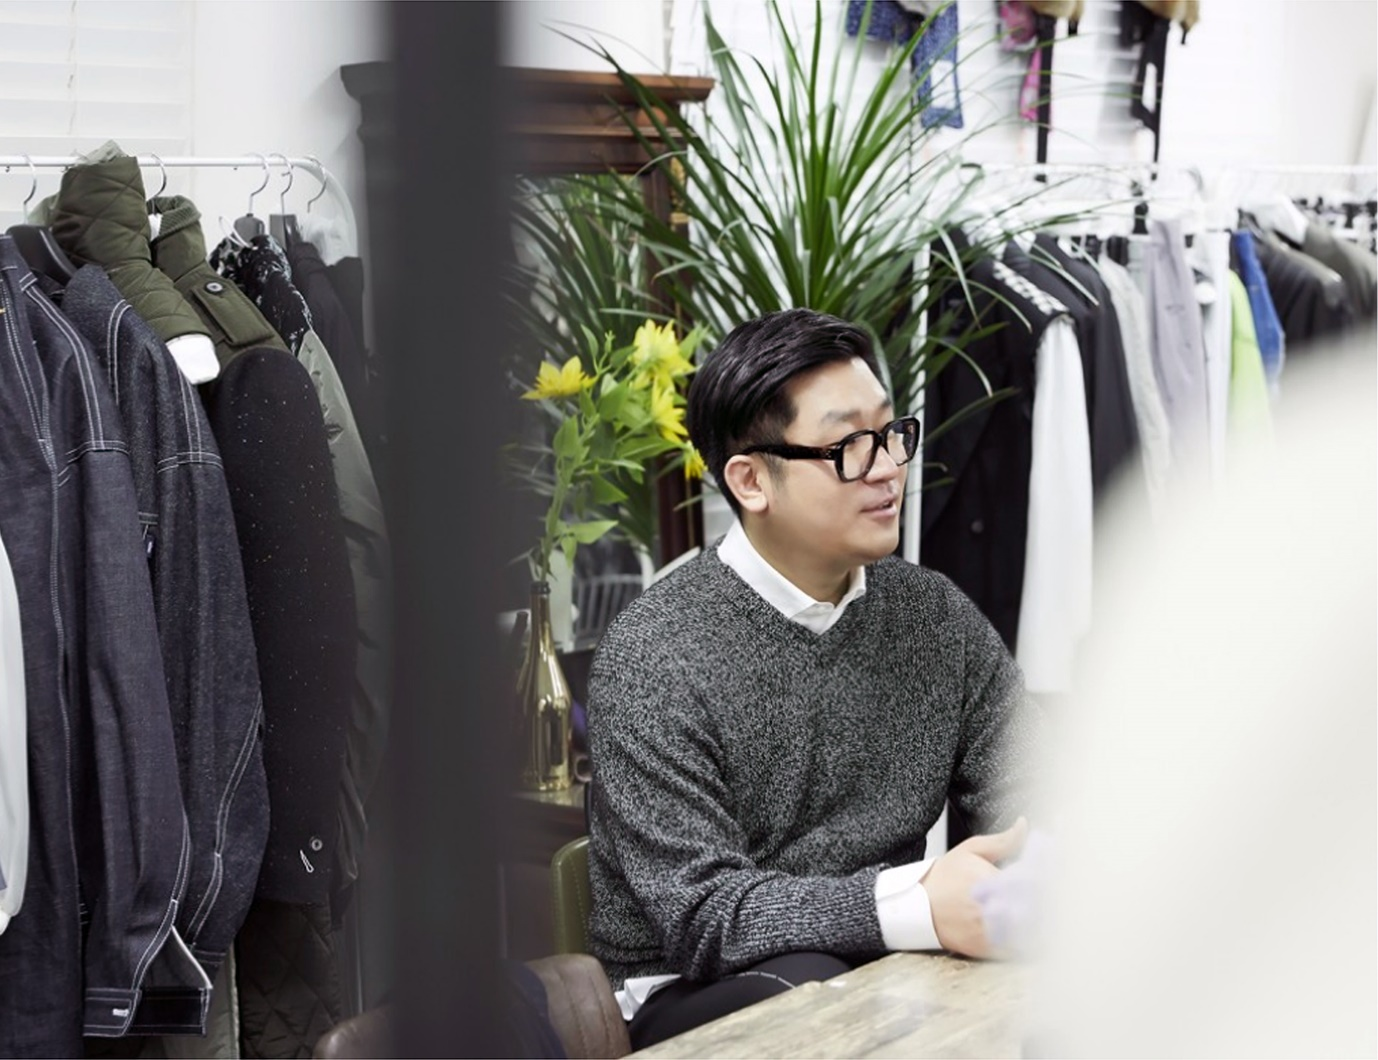 'MÜNN' 한현민 동문 인터뷰 첨부 이미지 -  뮌(MÜNN) 대표 한현민 사진